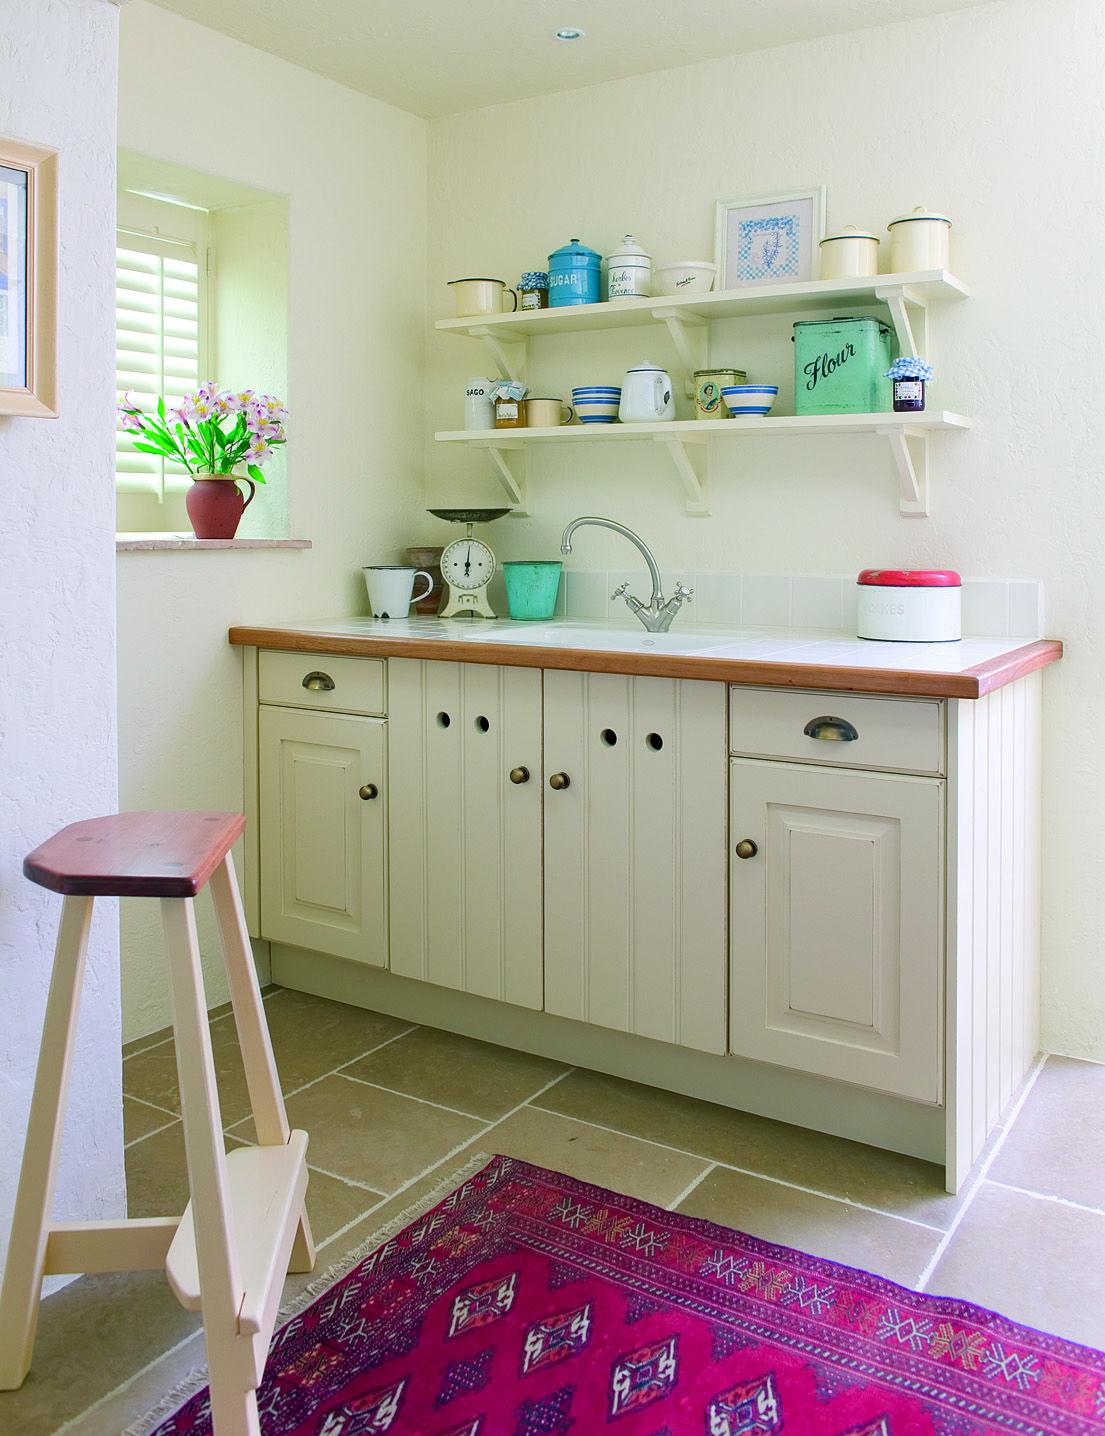 10x10 Laundry Room Layout: Laundry Room Design, Utility